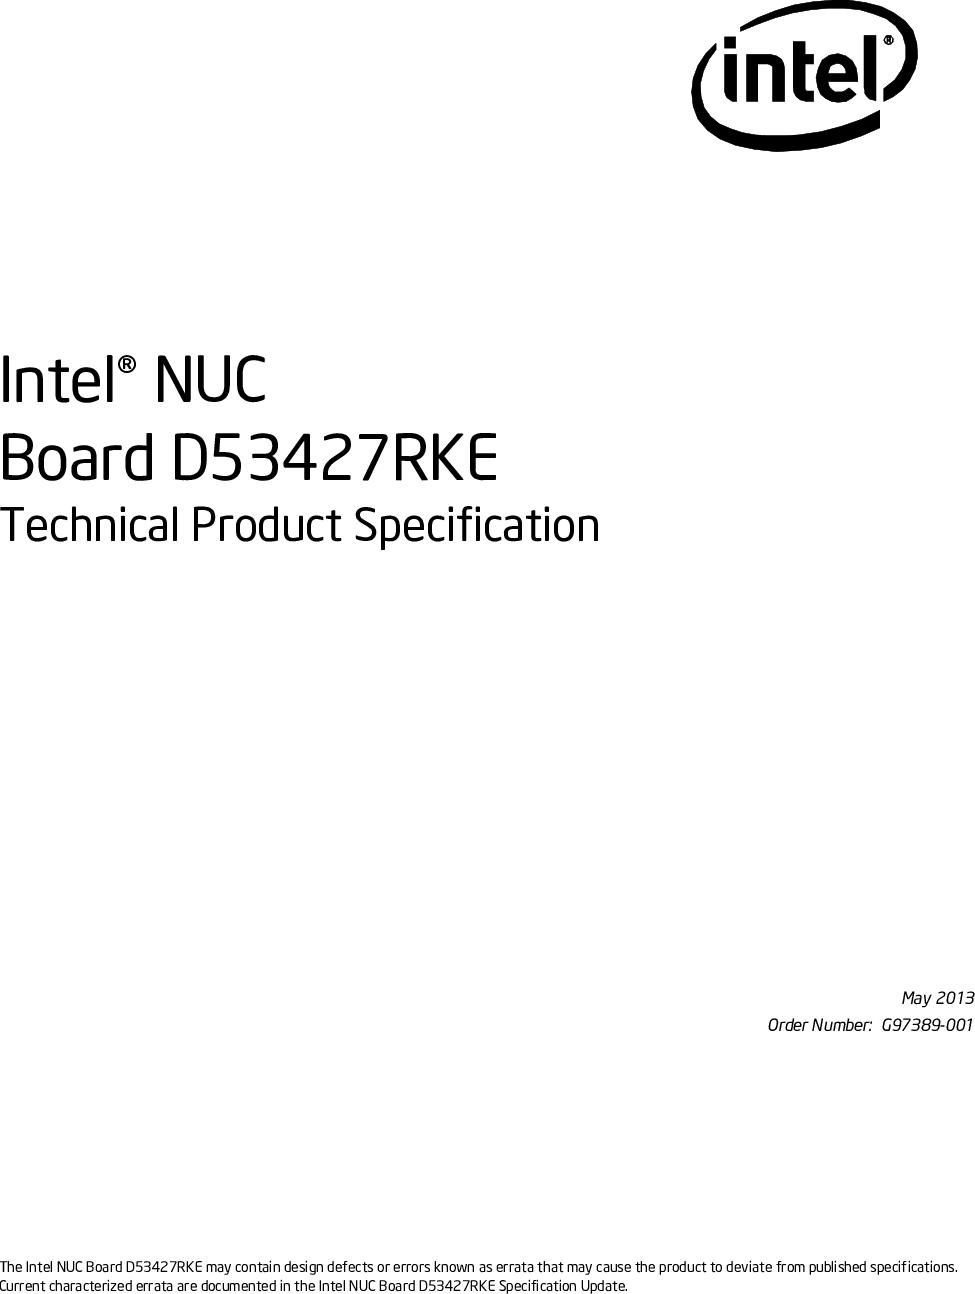 Intel BOXDC53427HYE Intel® NUC Board D53427RKE Technical